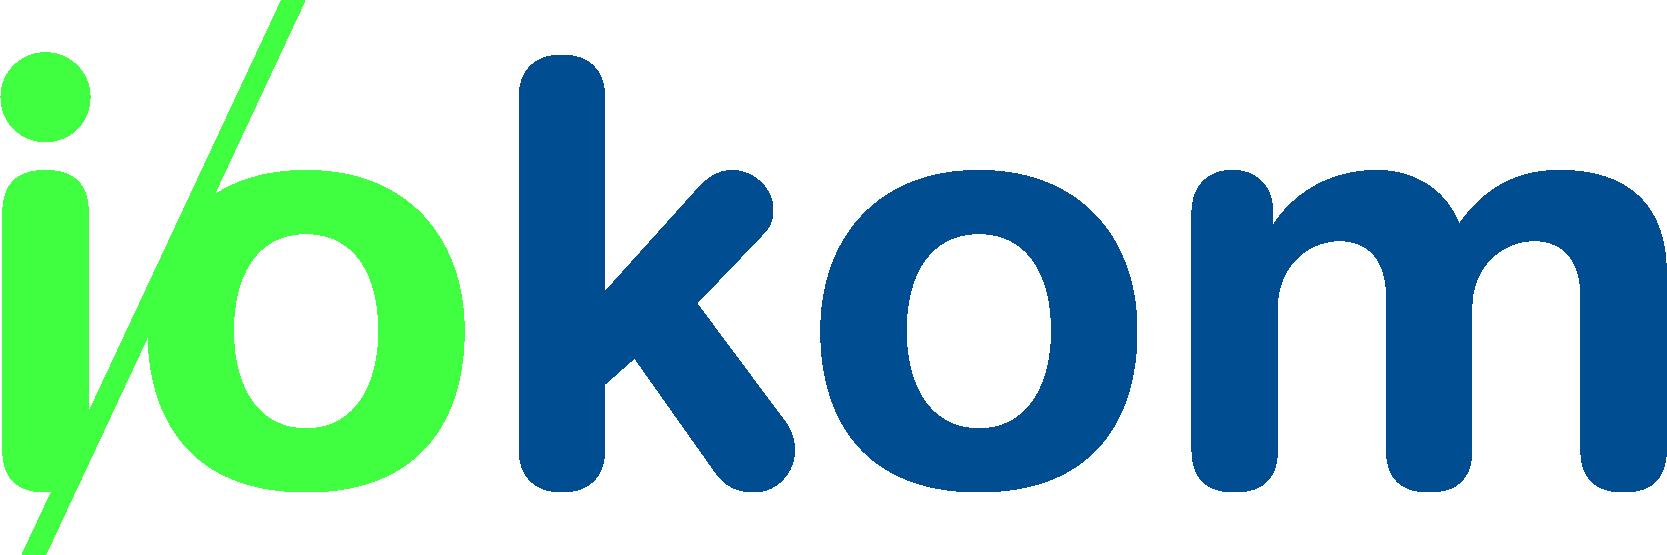 iokom